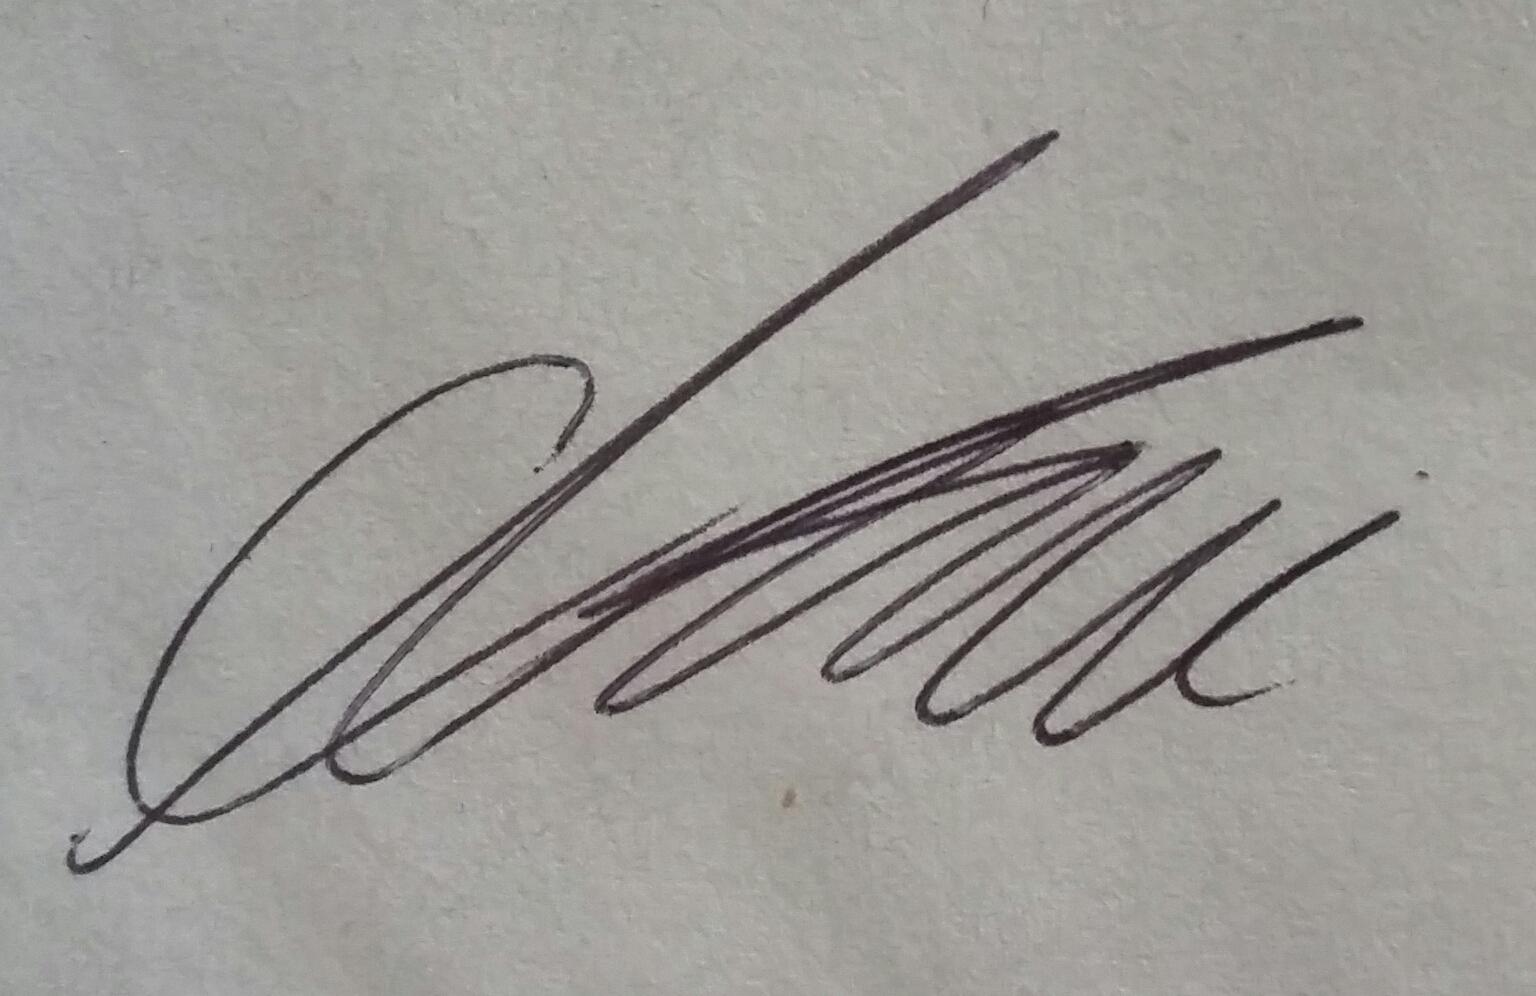 Cameron Gilham's Signature